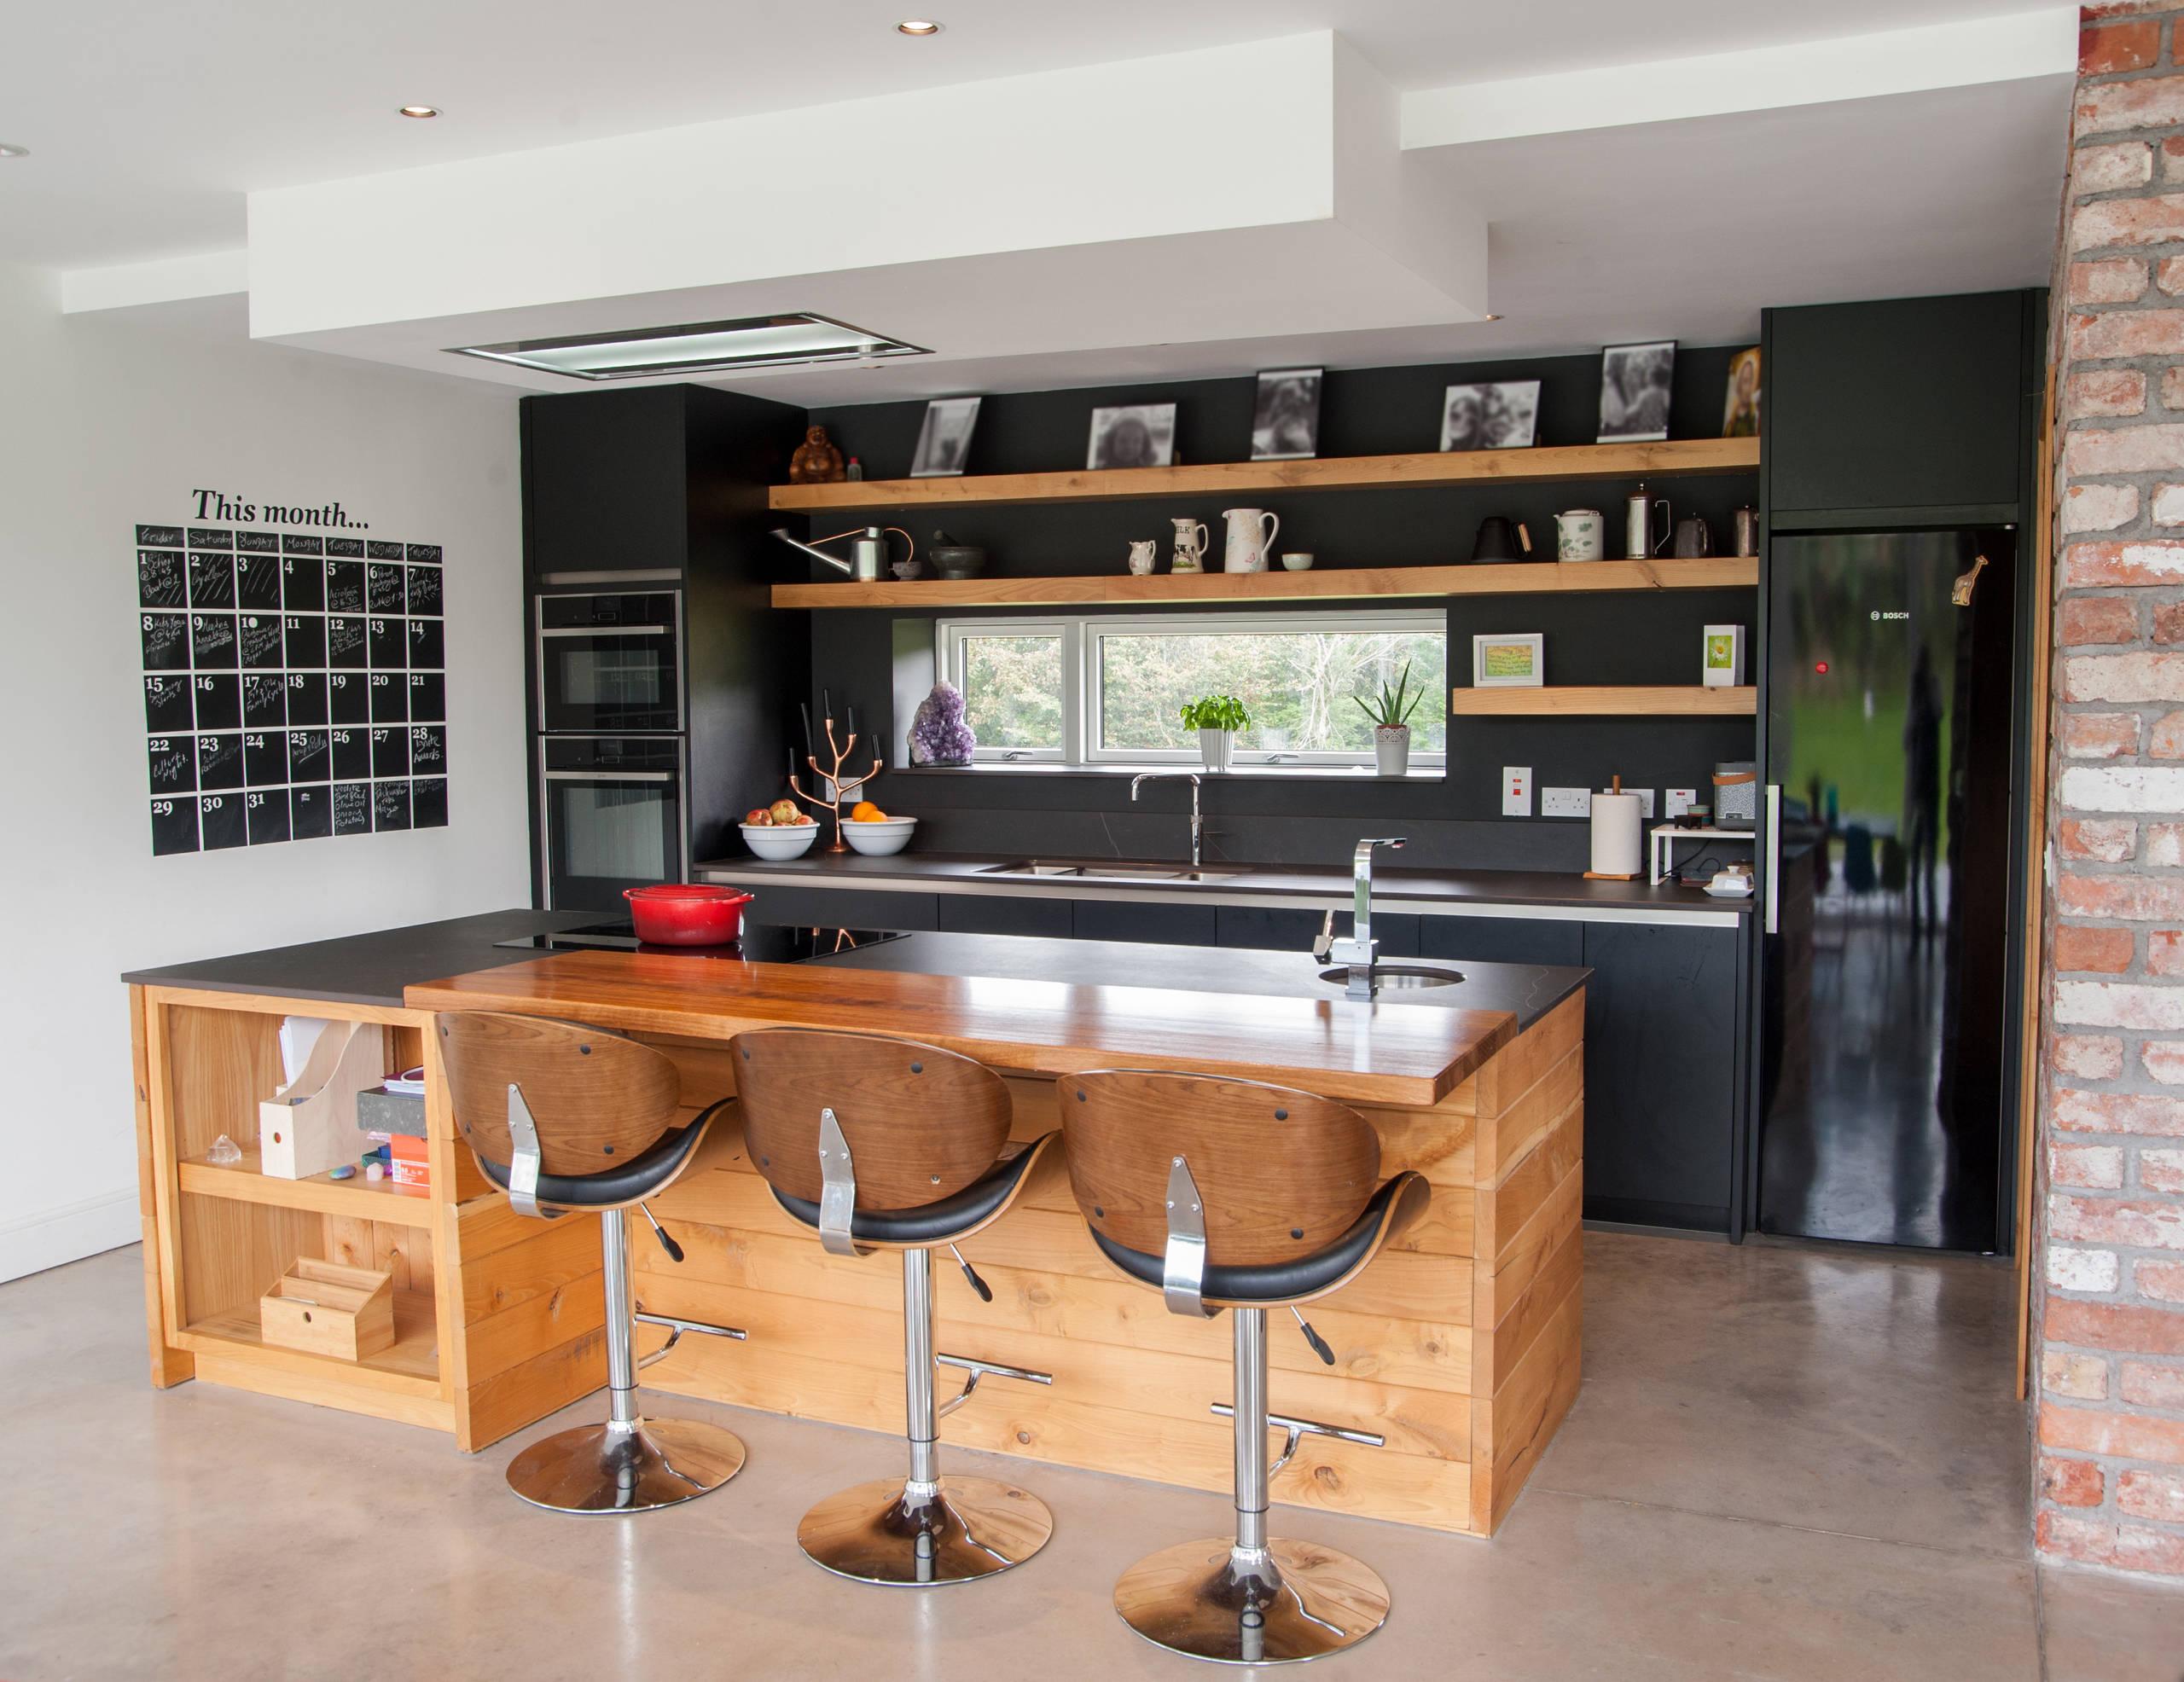 Bespoke Black Kitchen with Island